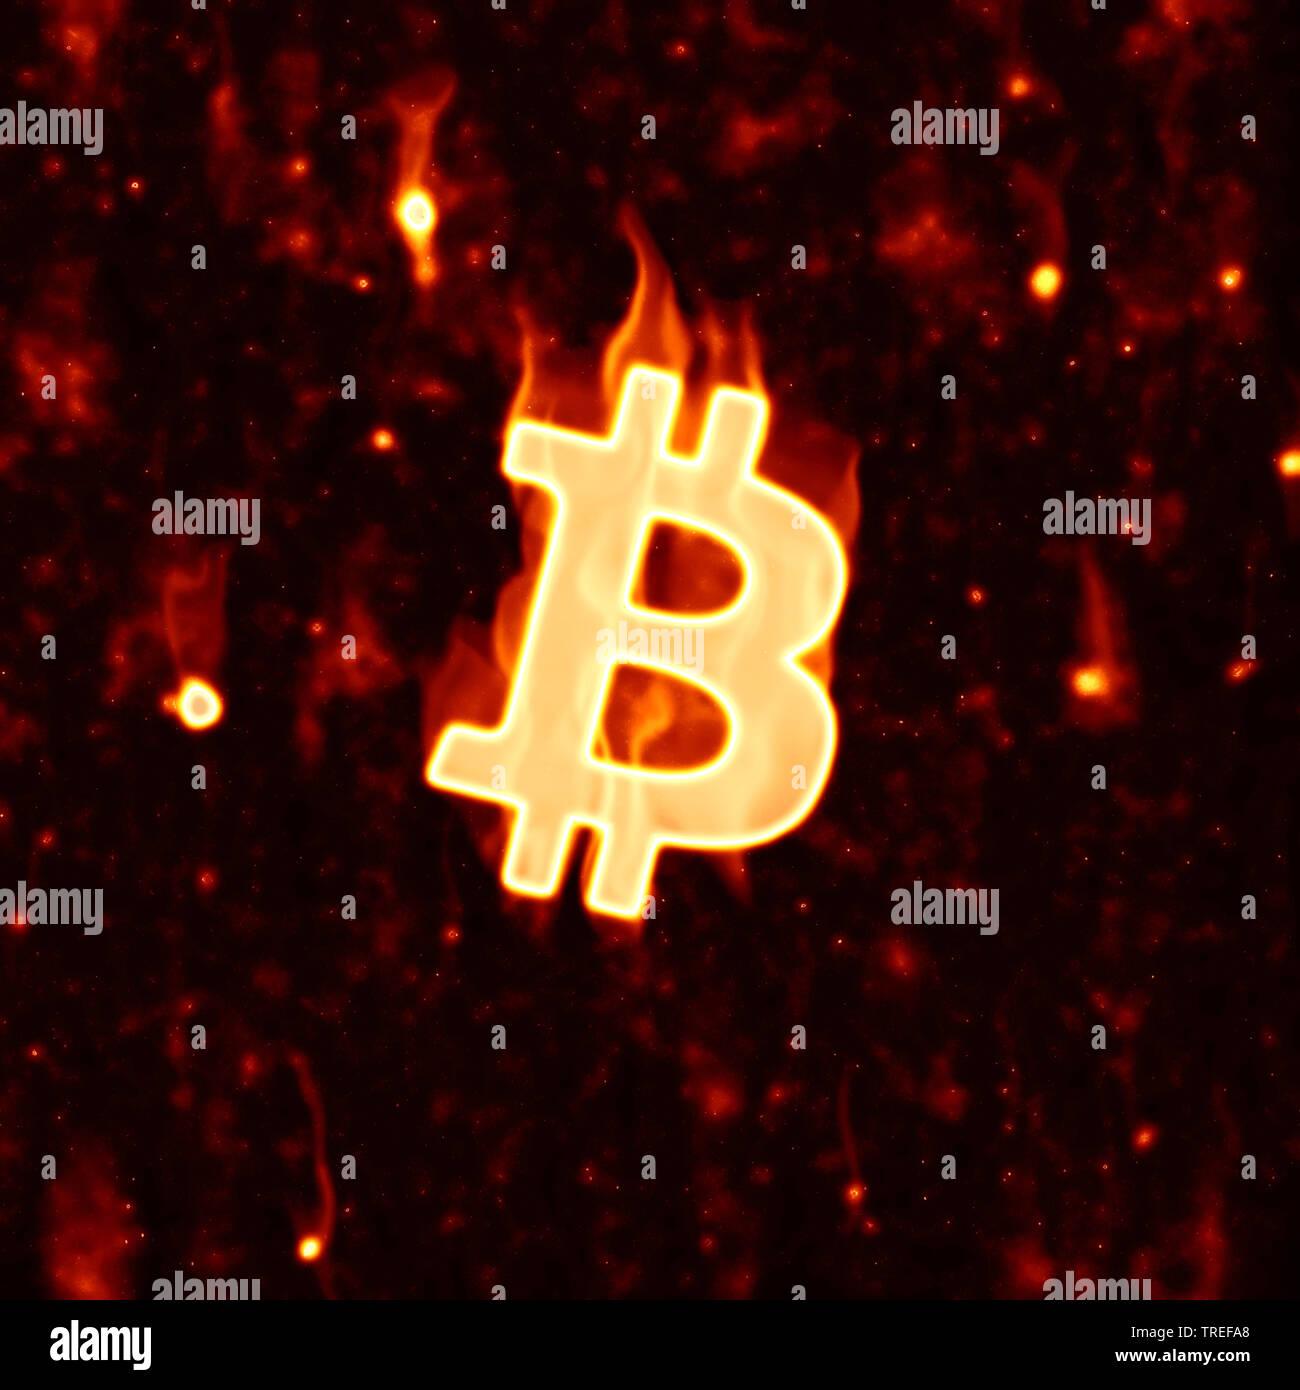 Bitcoin-Symbol, mit angedeutetetn Flammen vor Lava-Hintergrund | Bitcoin symbol with indicated flames against a lava background | BLWS525171.jpg [ (c) - Stock Image